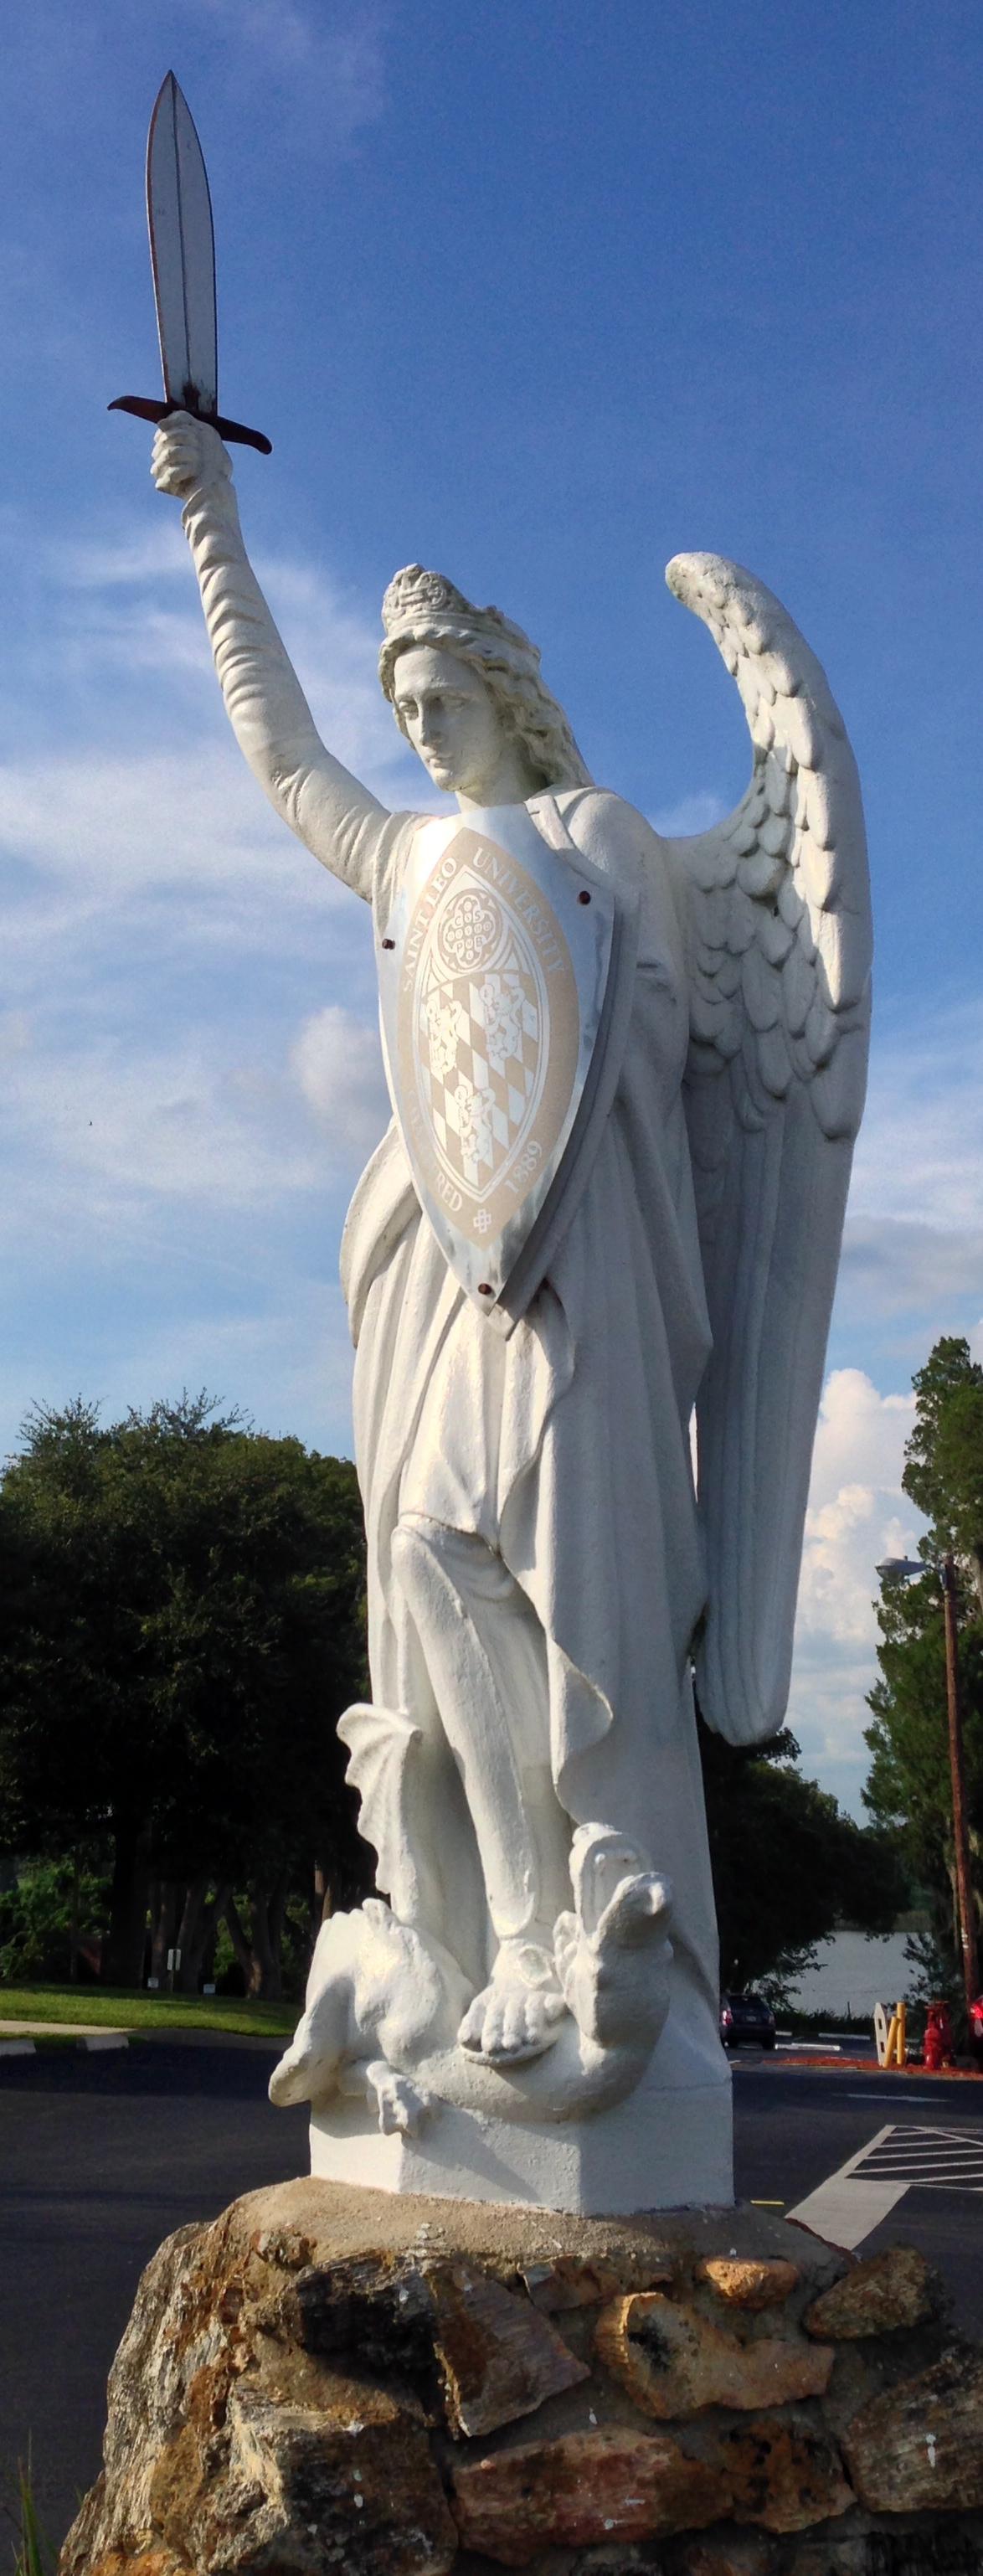 2014-09-18 Saint Michael